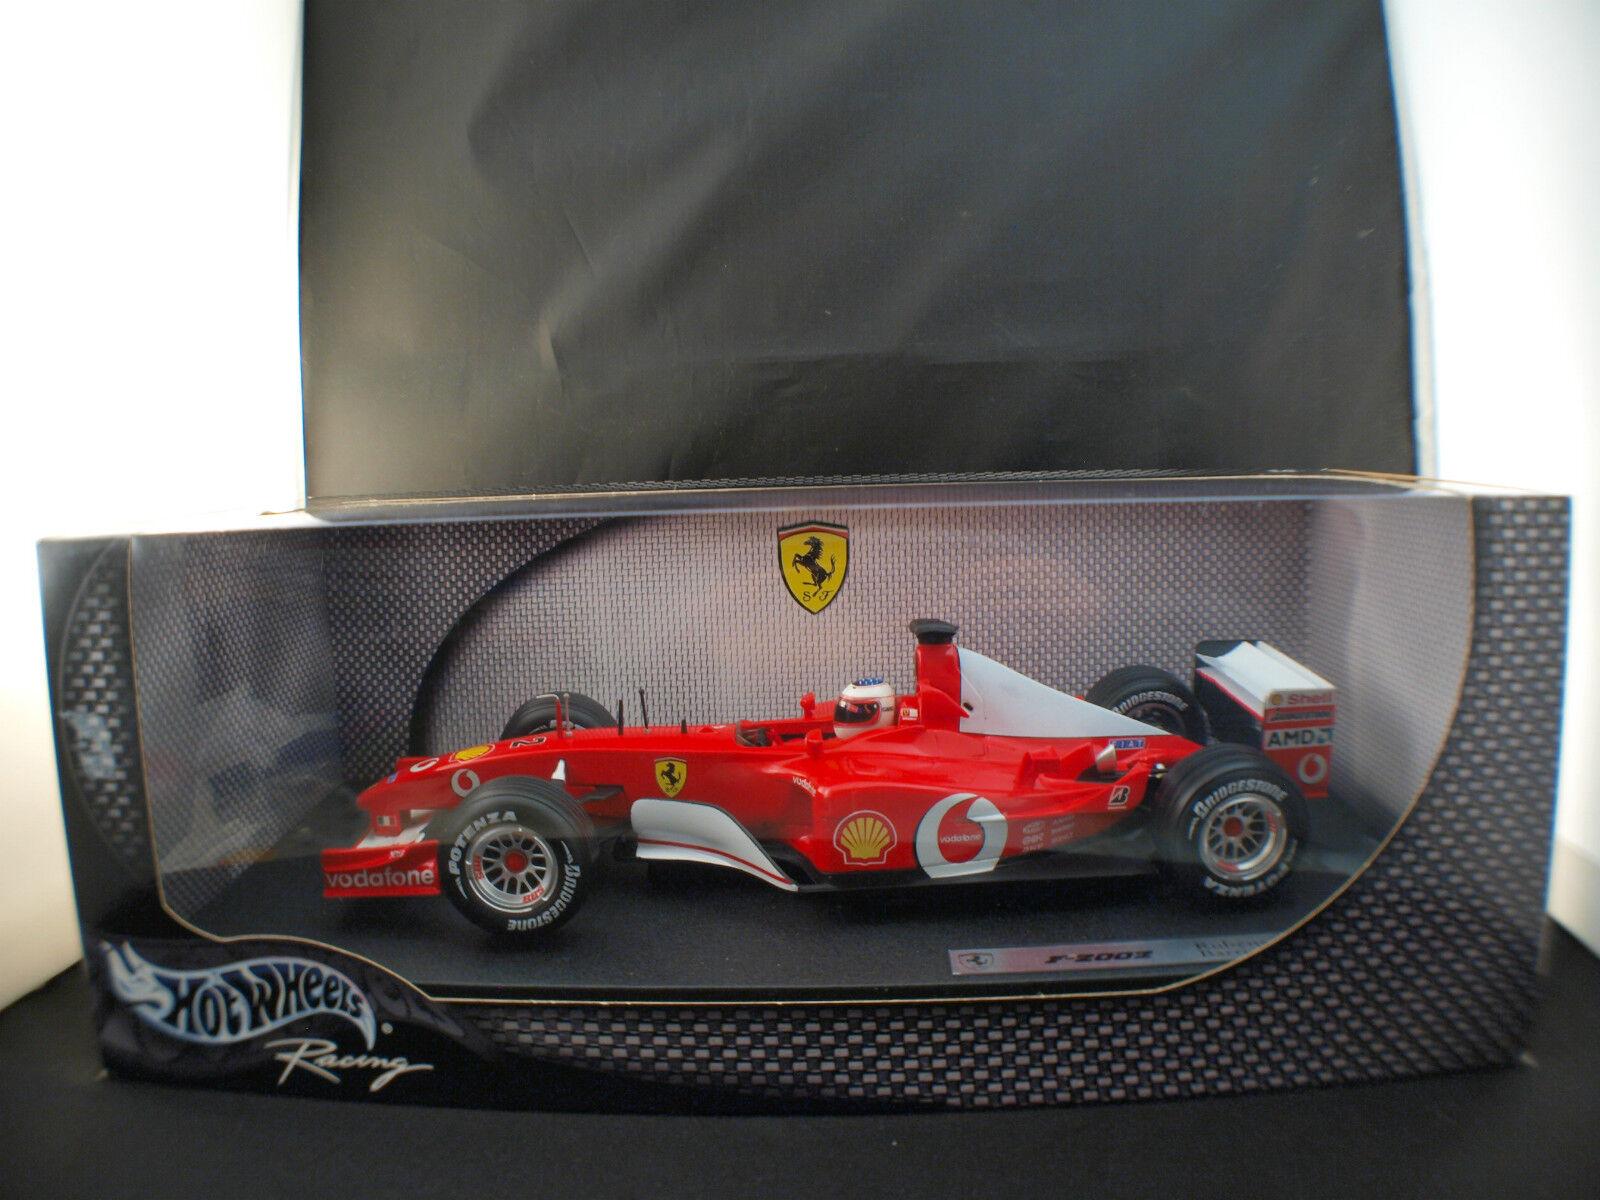 Hot Wheels n° 54627 ferrari F1 2002 Rubens Barrichello neuf 1 18 en boite MIB